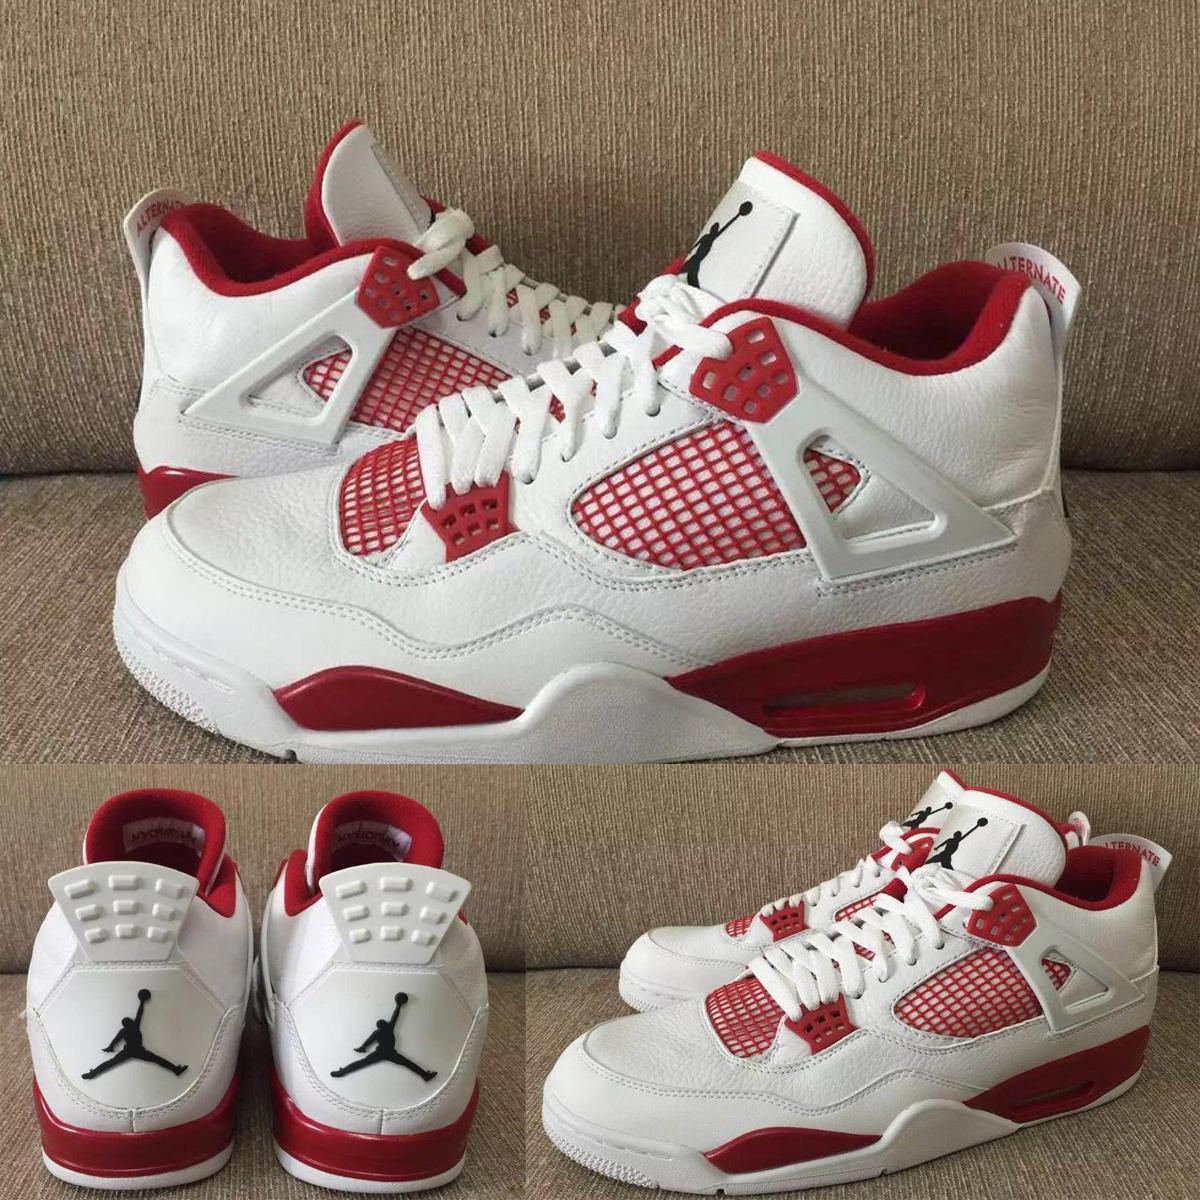 Mens Air Jordan 4 IV) Retro High Cool Grey shoes